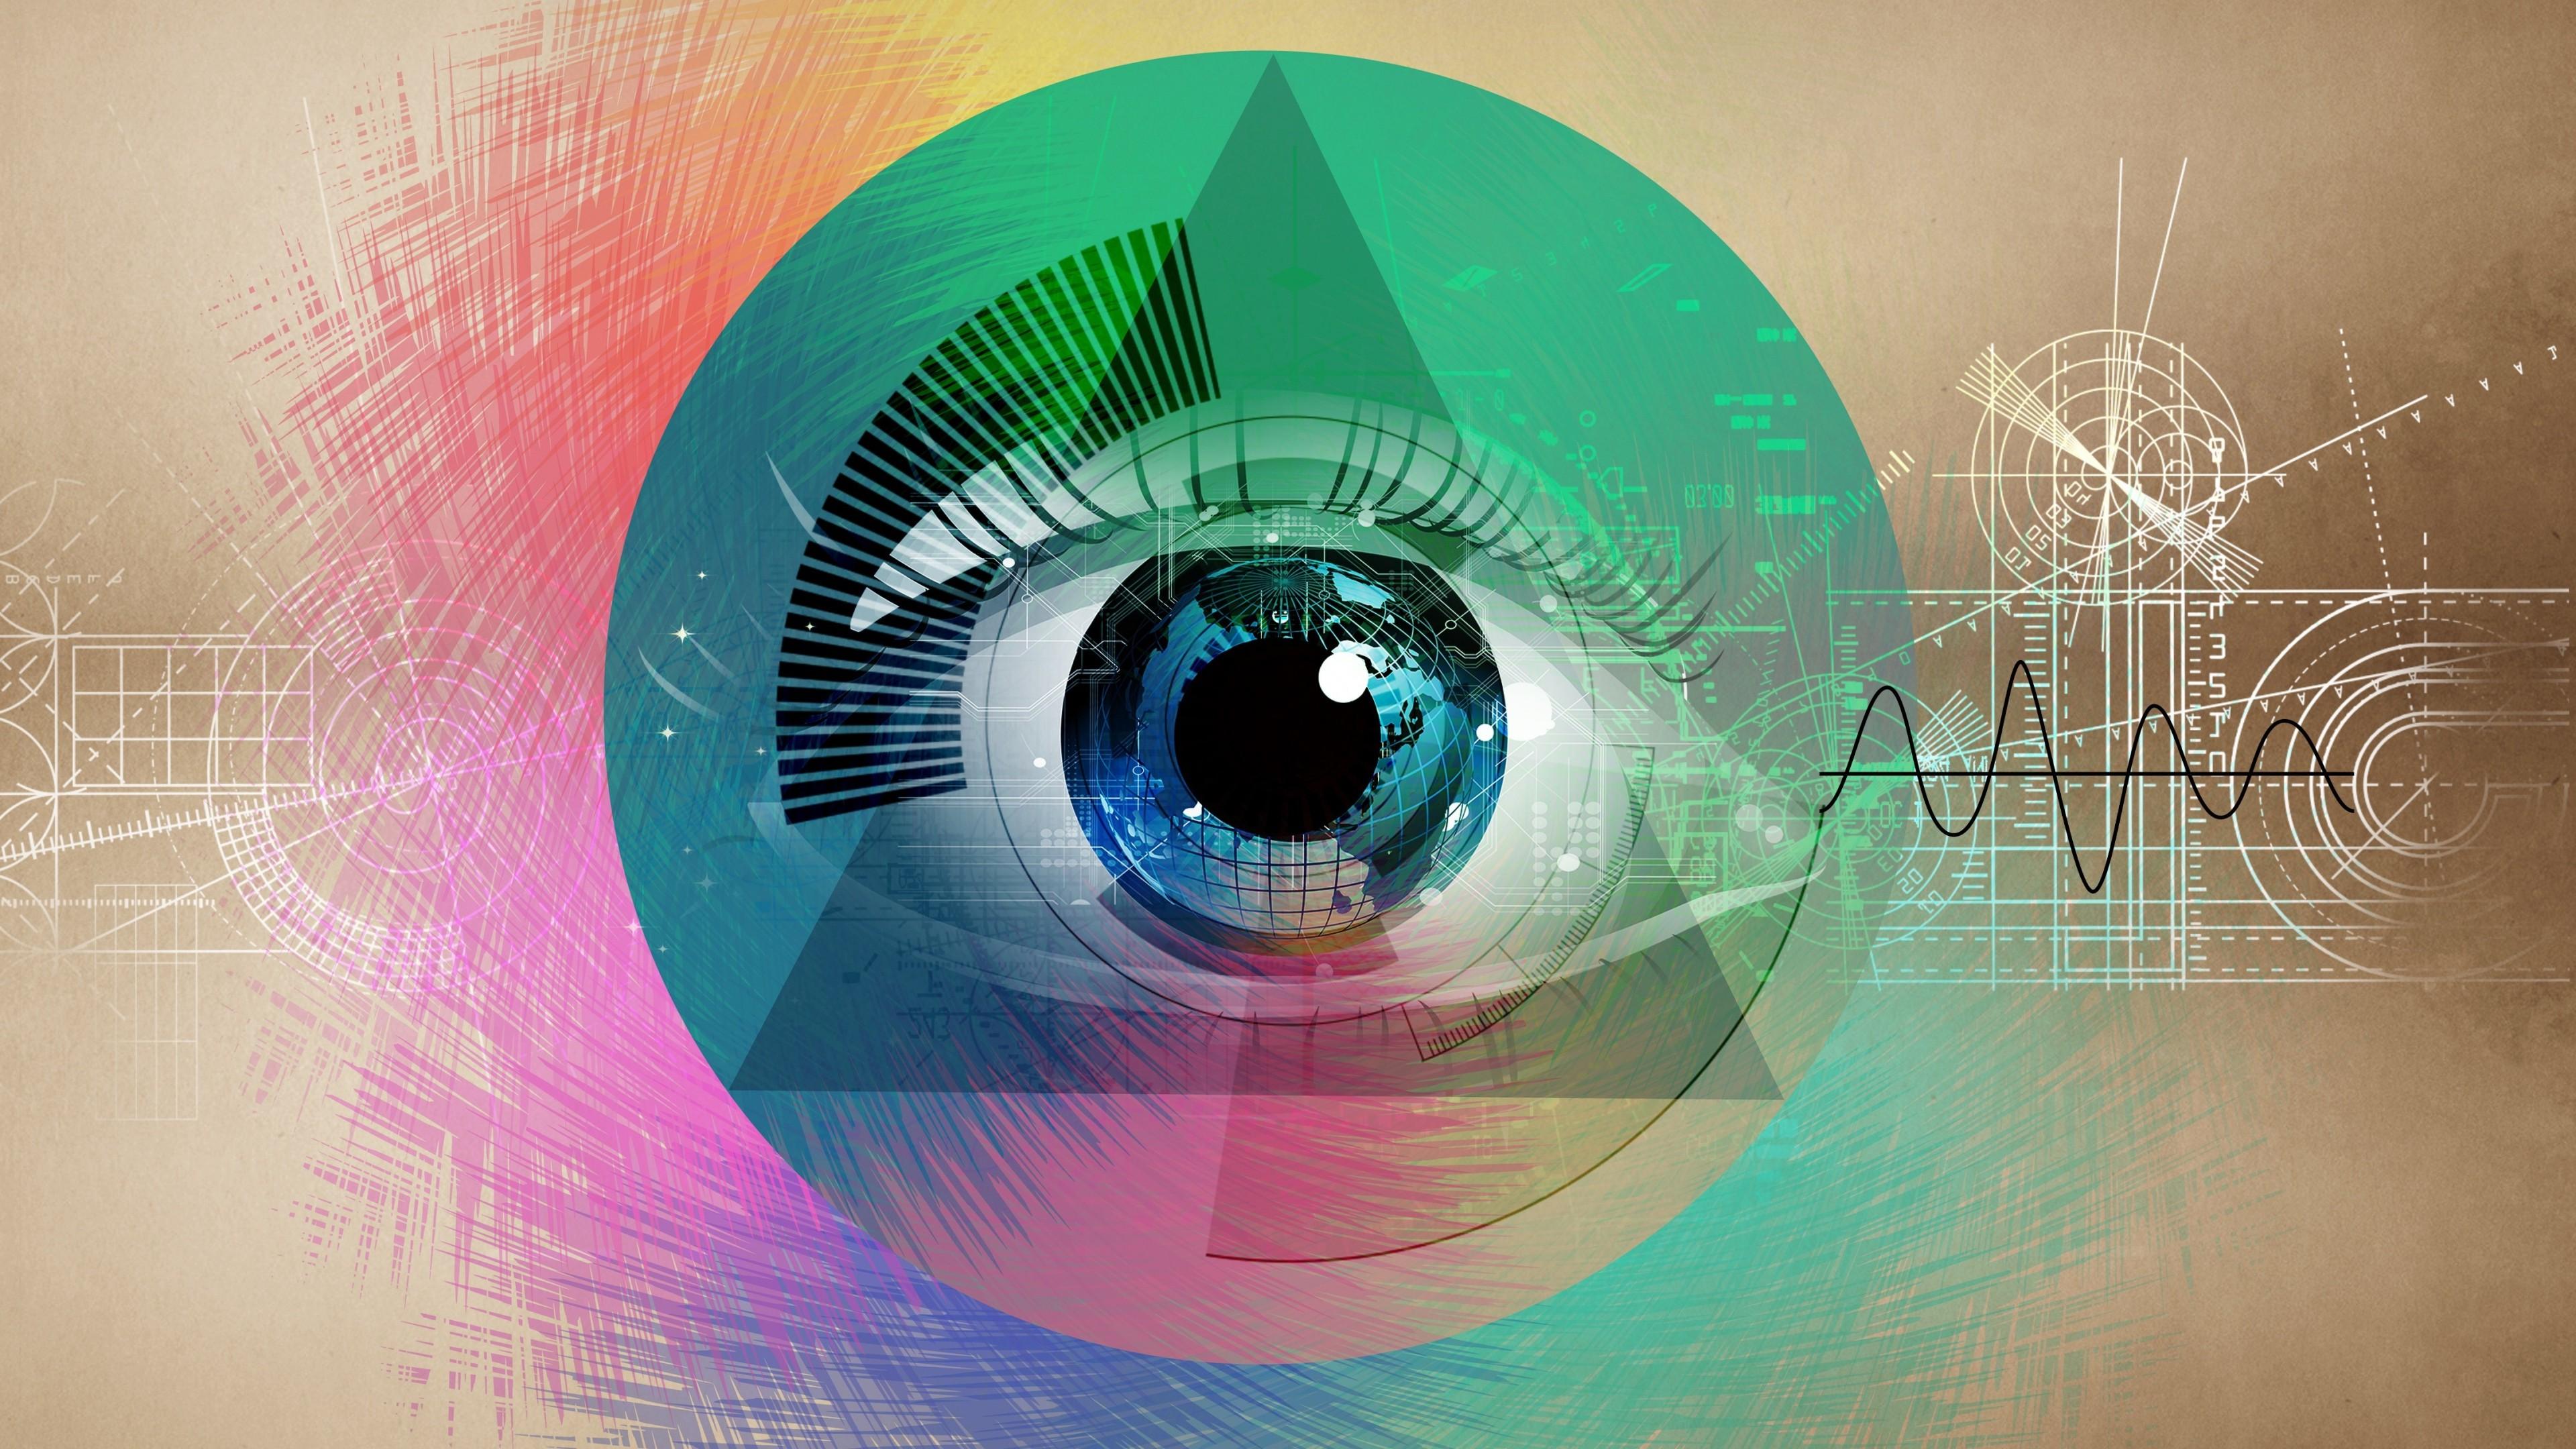 Illustration Eyes Abstract Artwork Graphic Design Circle Illuminati Vintage Compact Disc Iris ART Eye Graphics 3840x2160